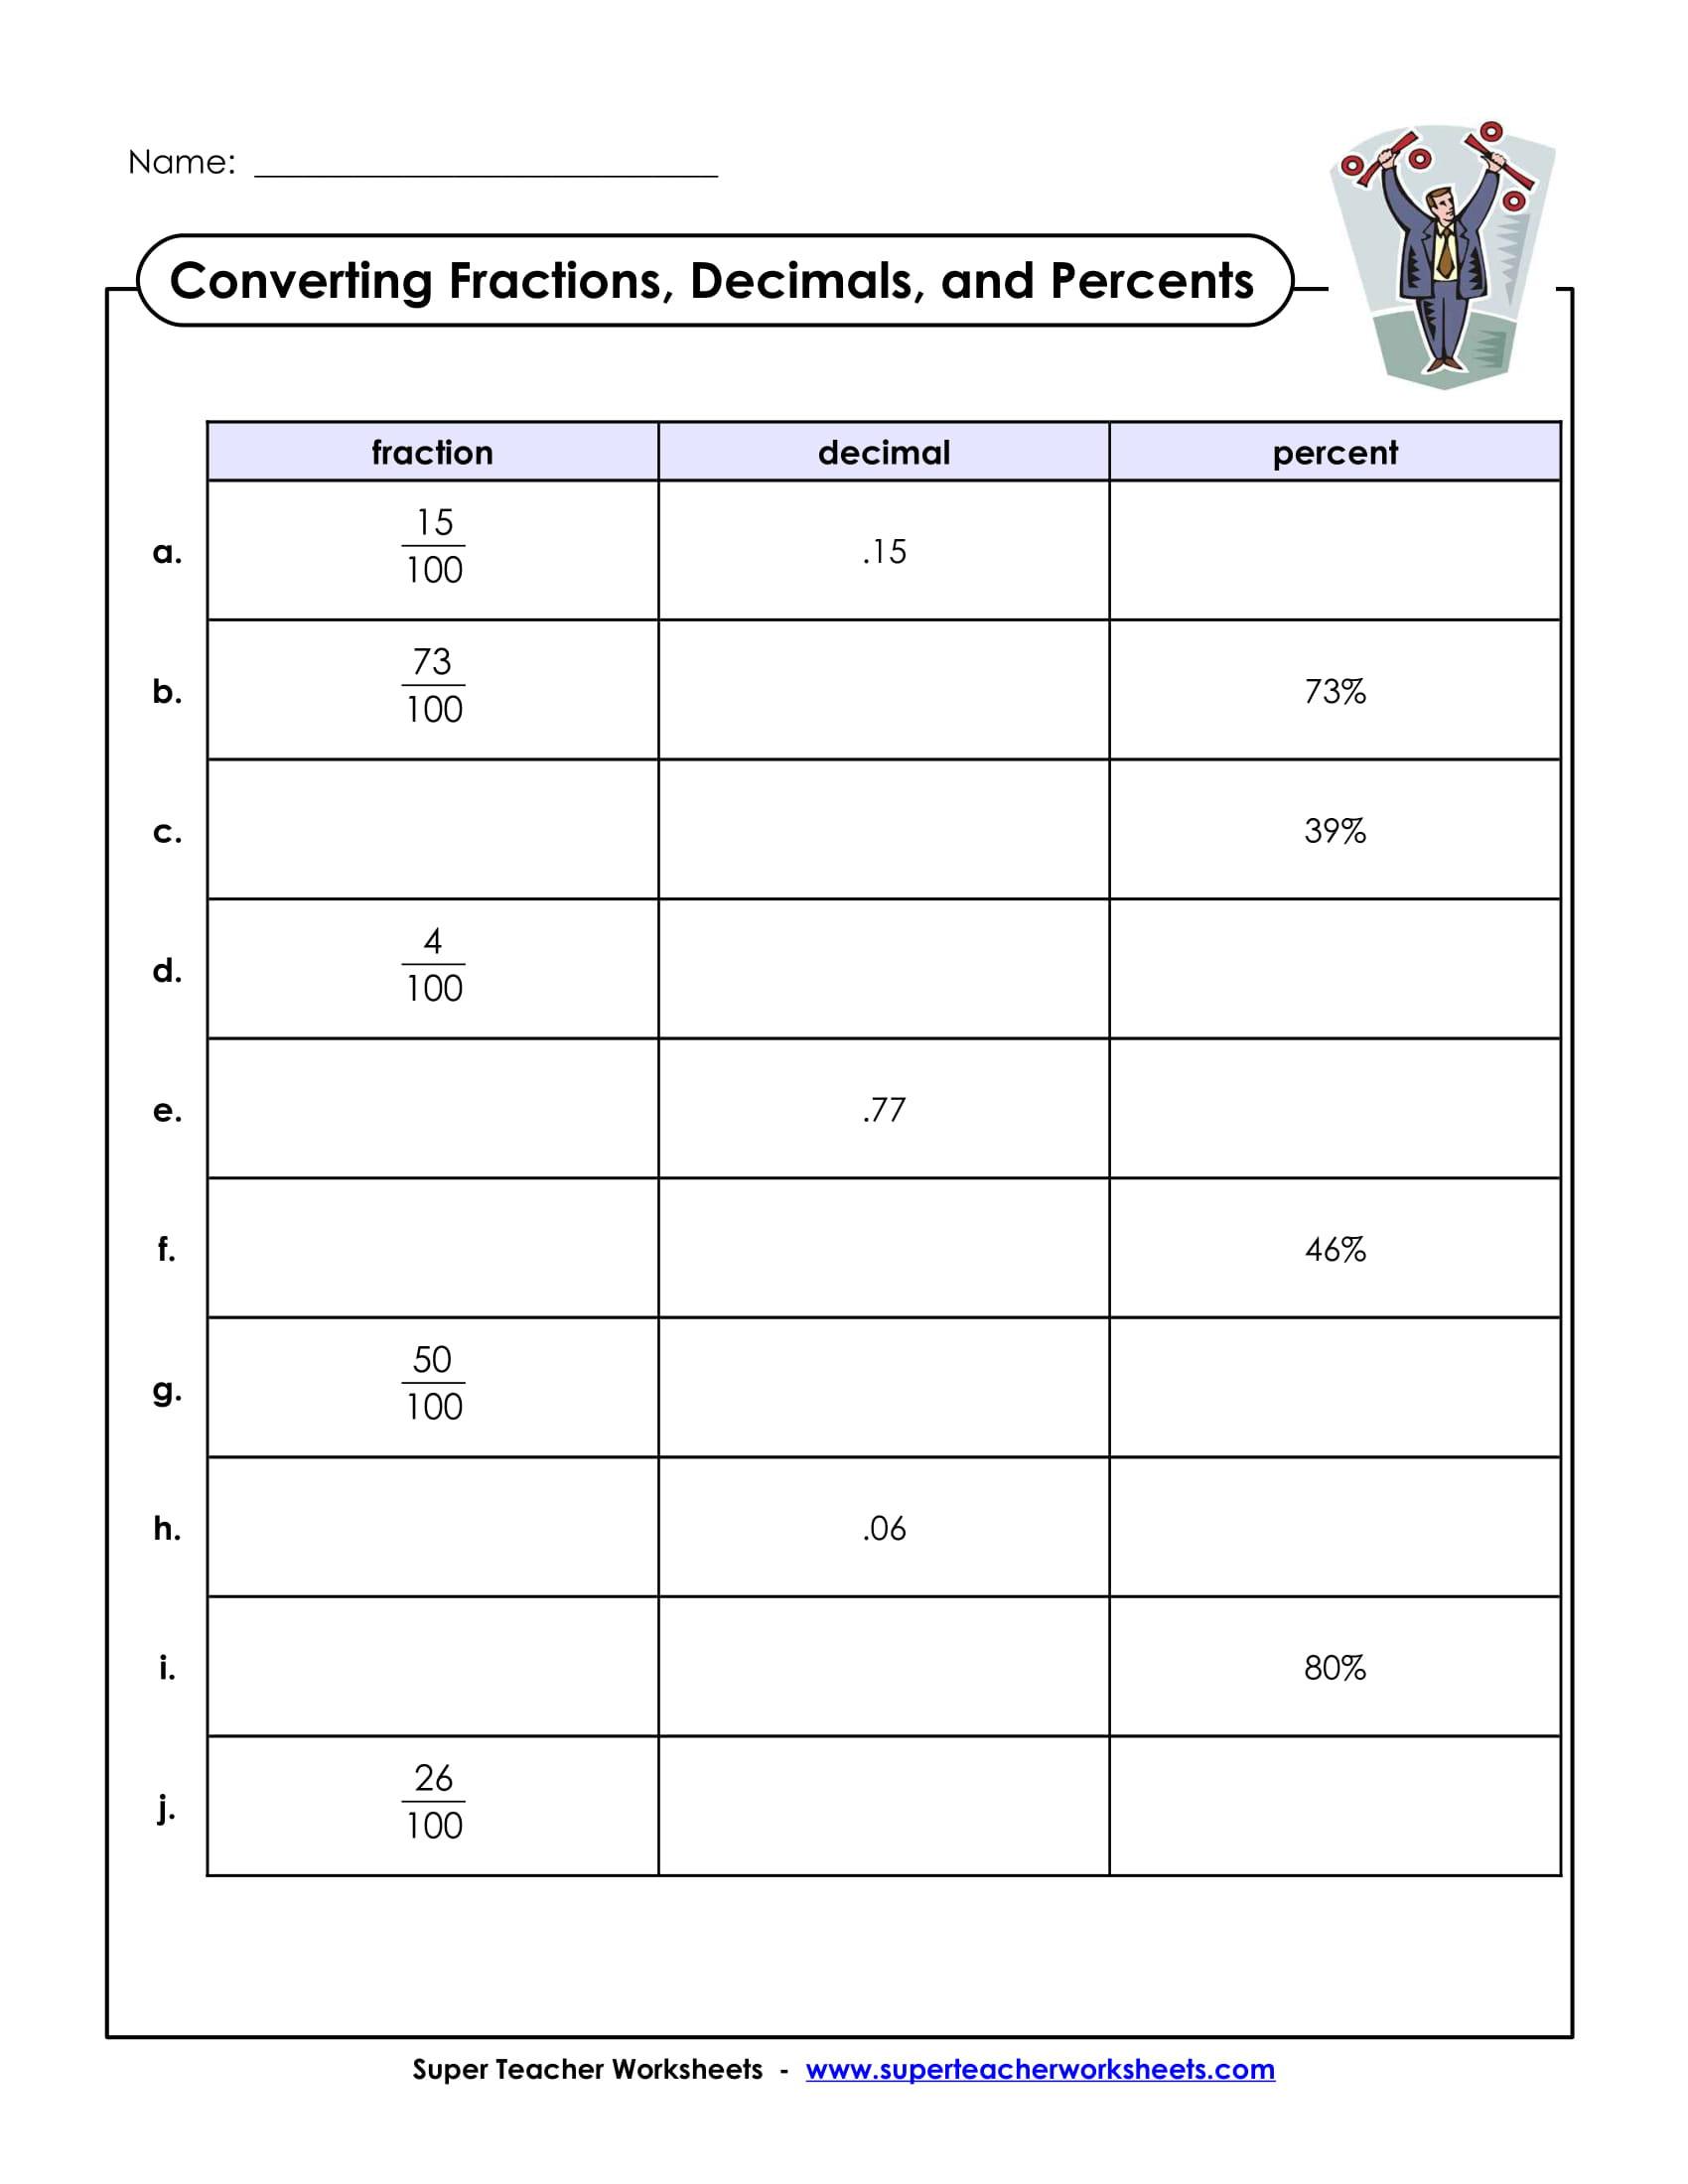 30 Ionic Bonding Worksheet Key